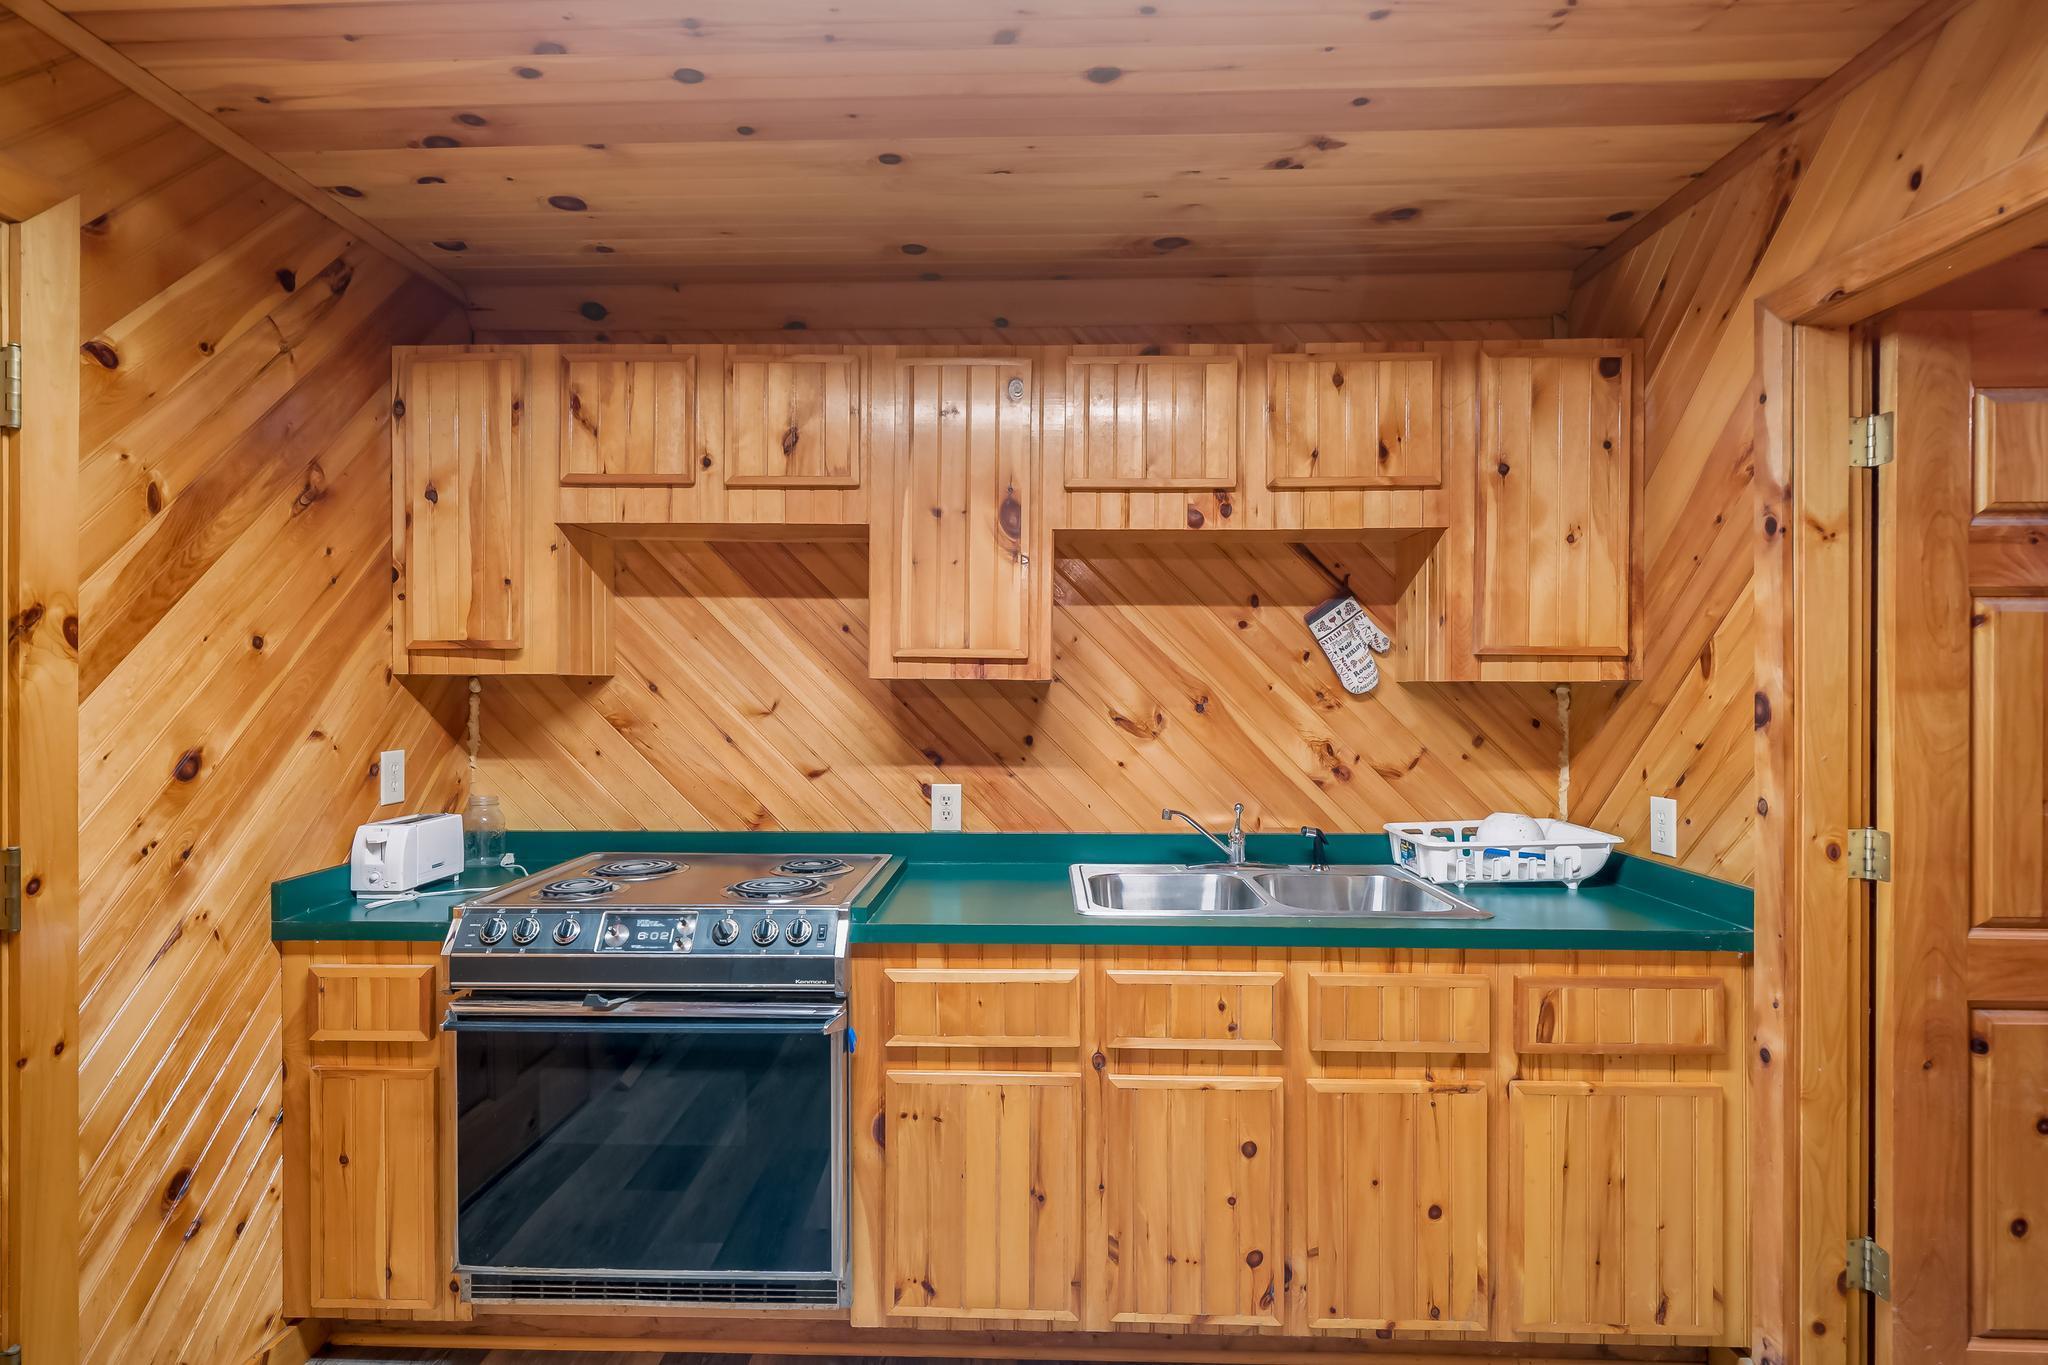 780 Bill Icenhour Lane Lodge (19 of 22)